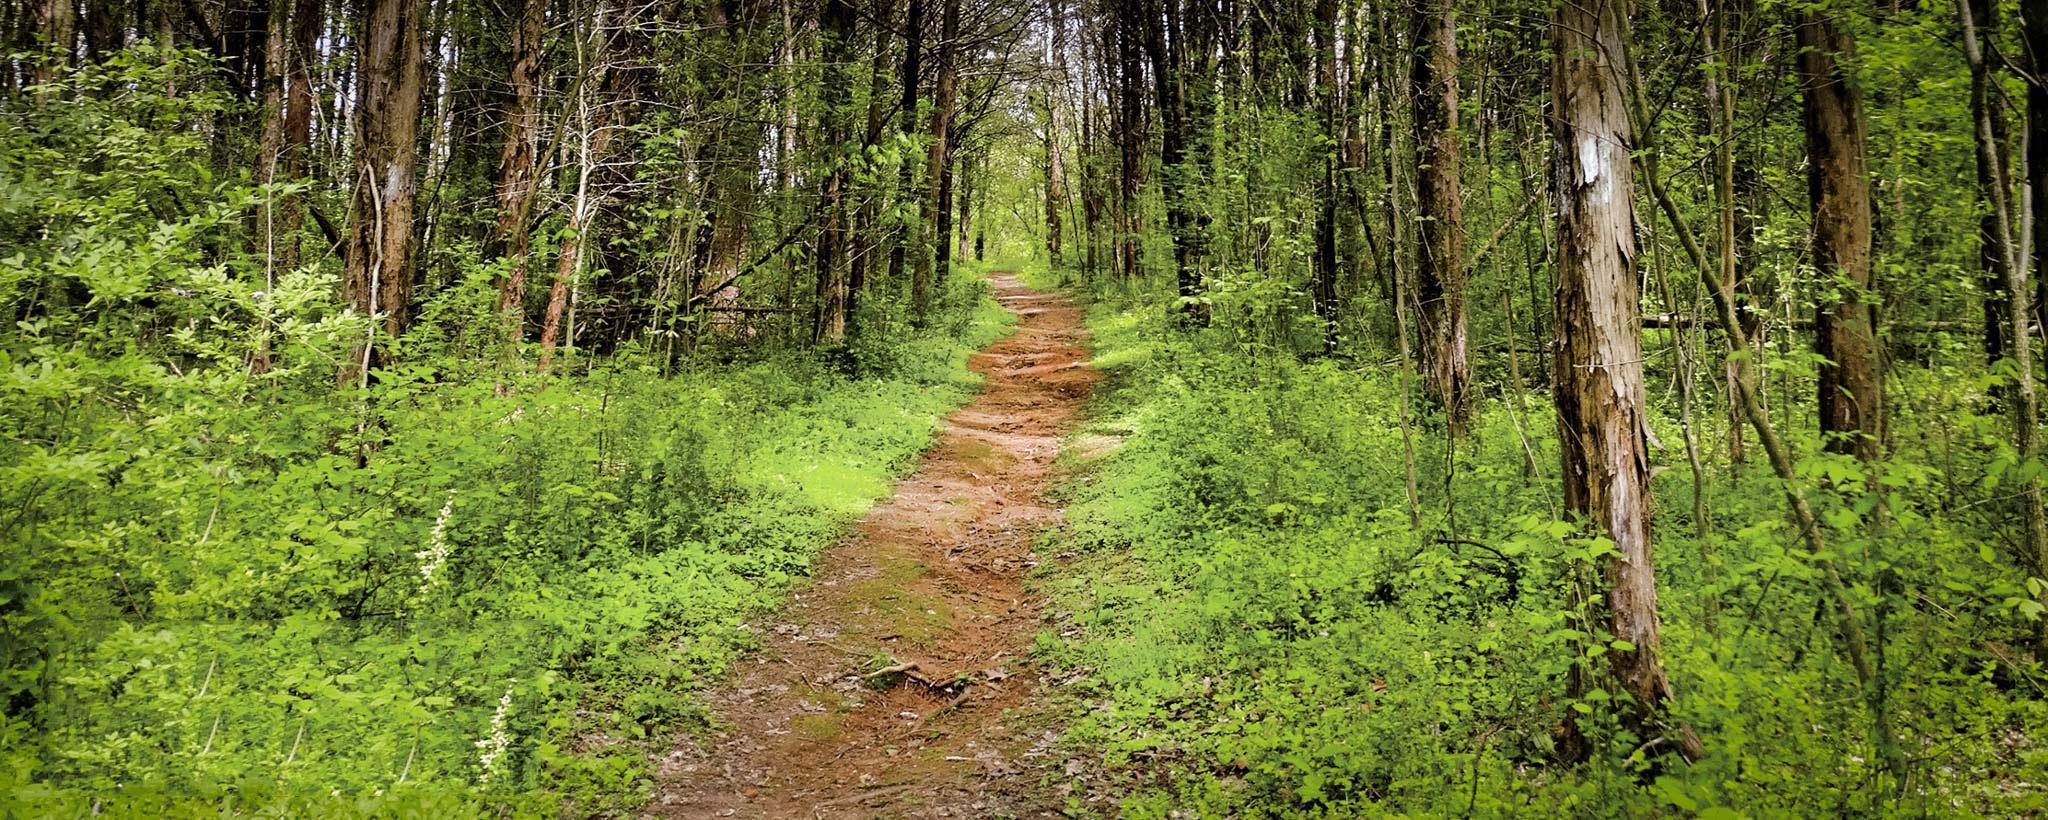 Melton Hill Trail